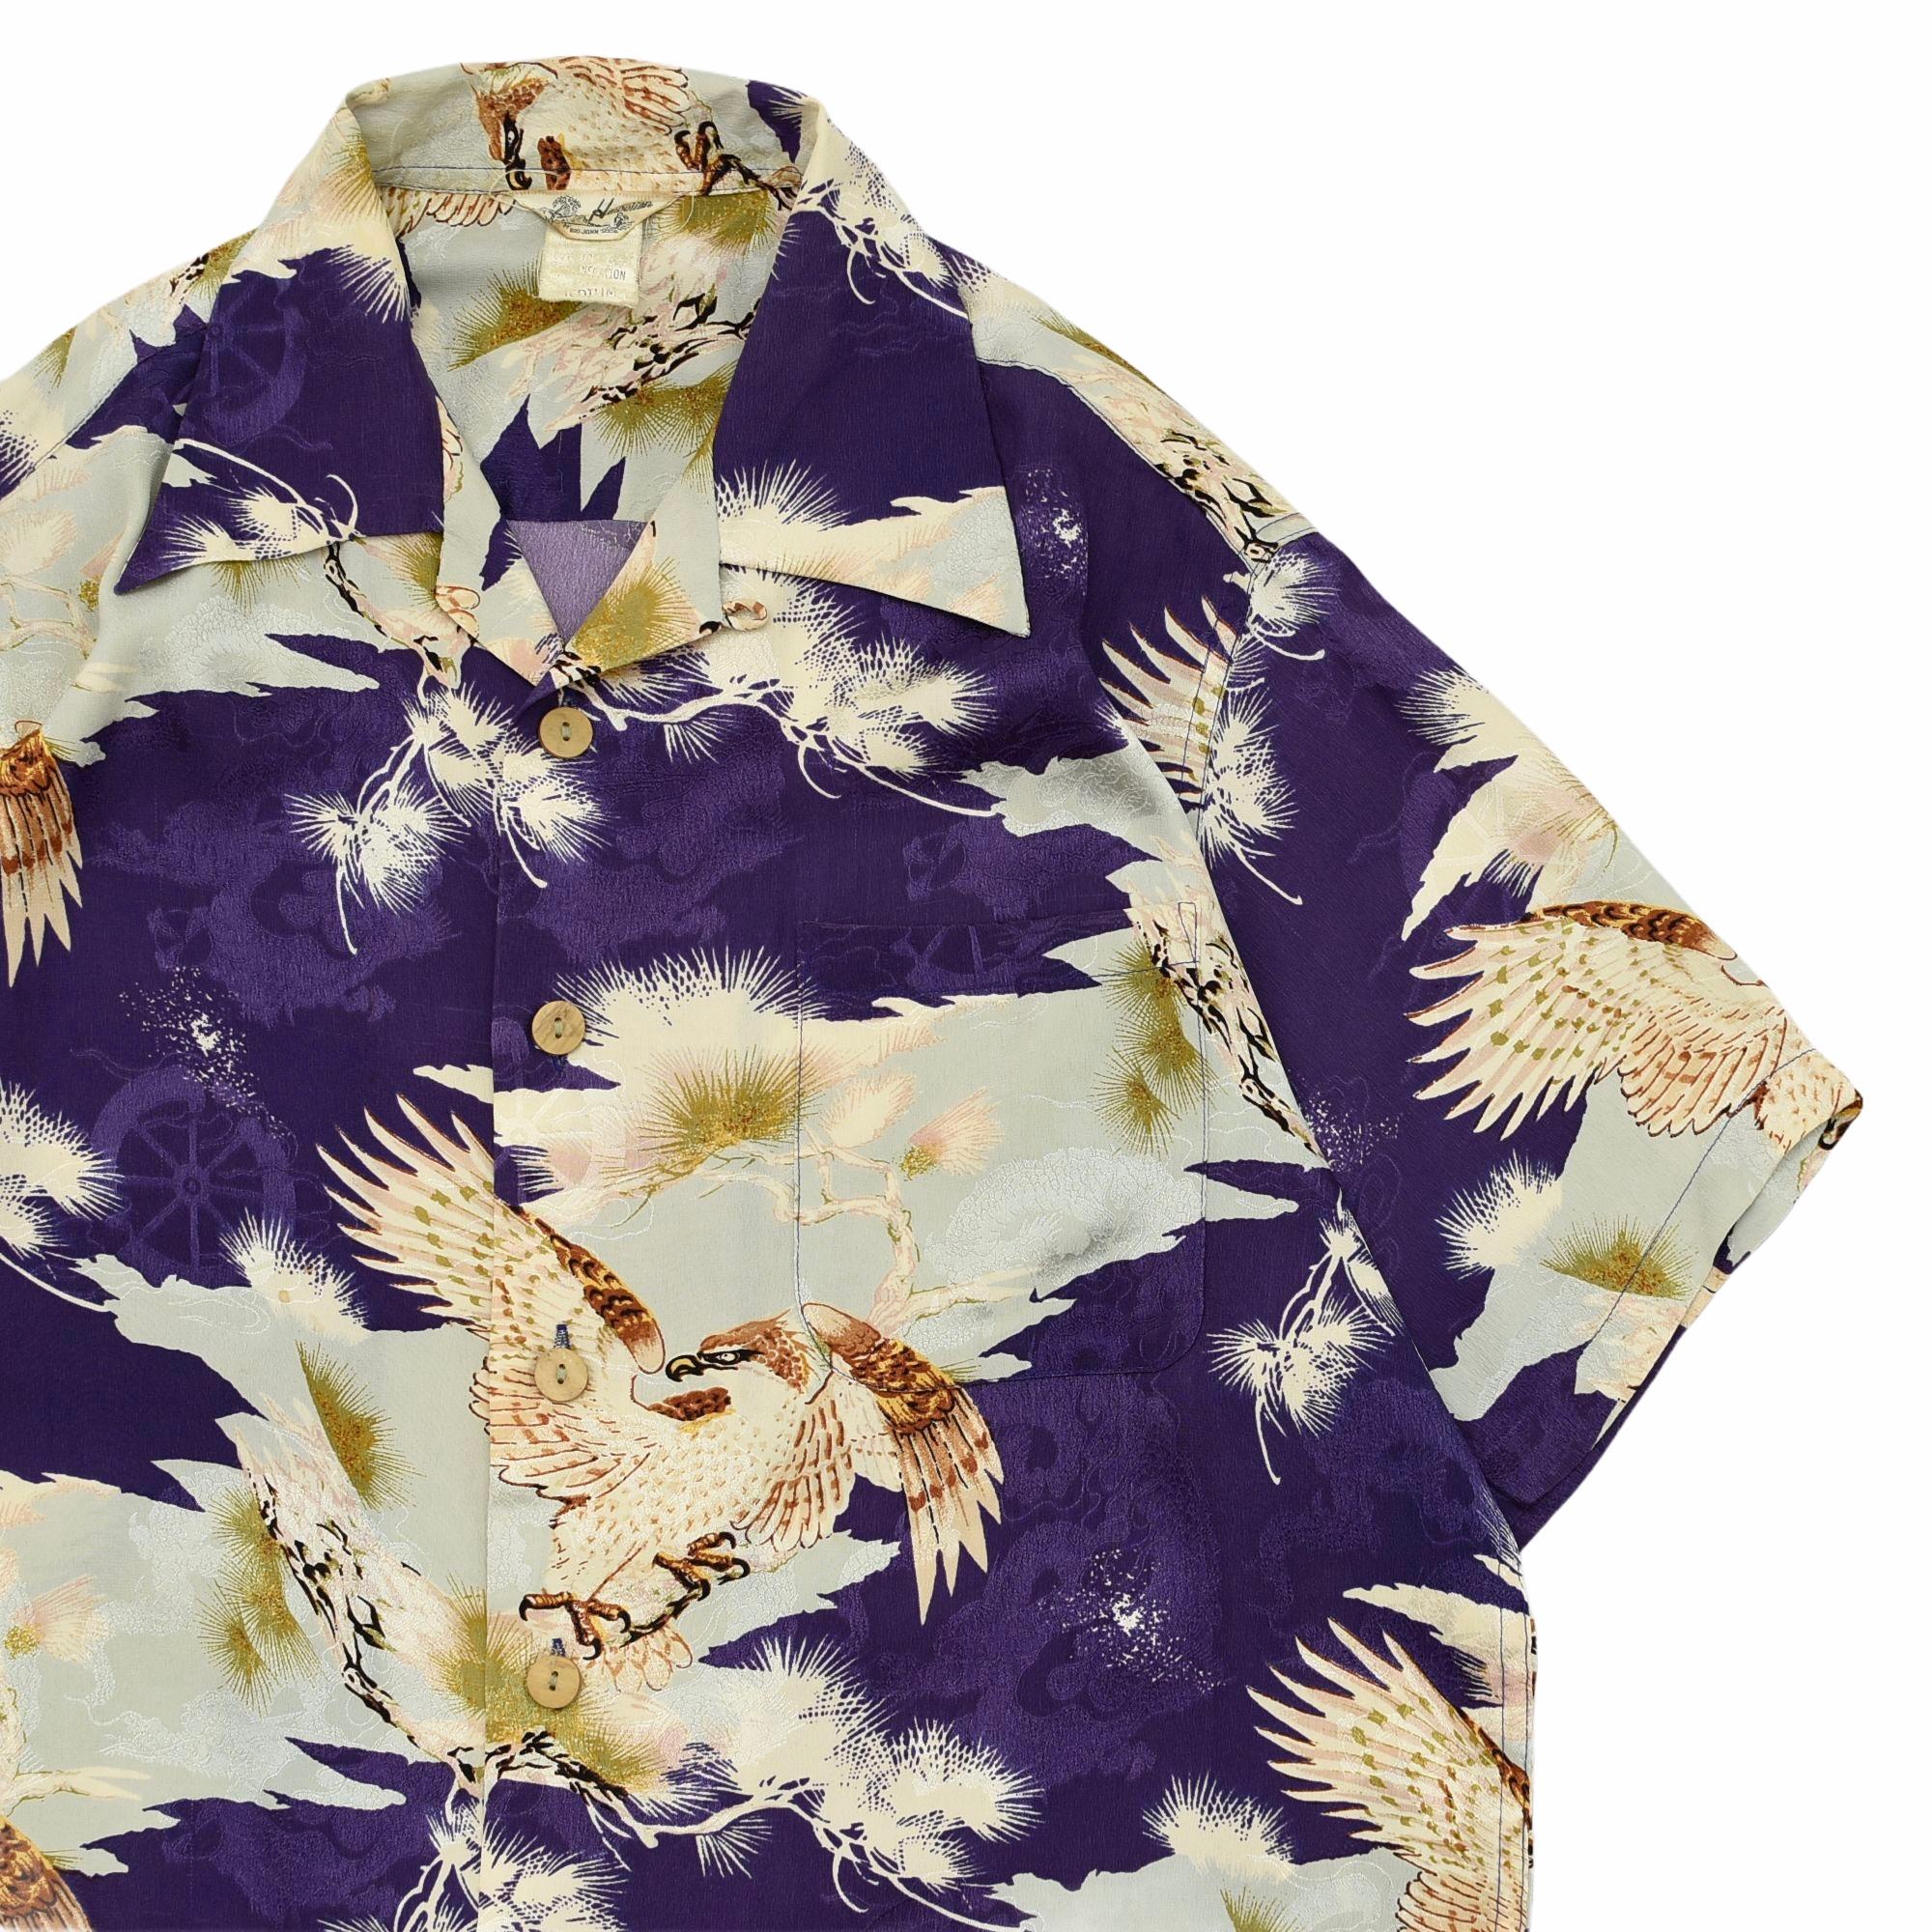 Vintage Hawaiian by BIG JOHN 和柄 silk aloha shirt